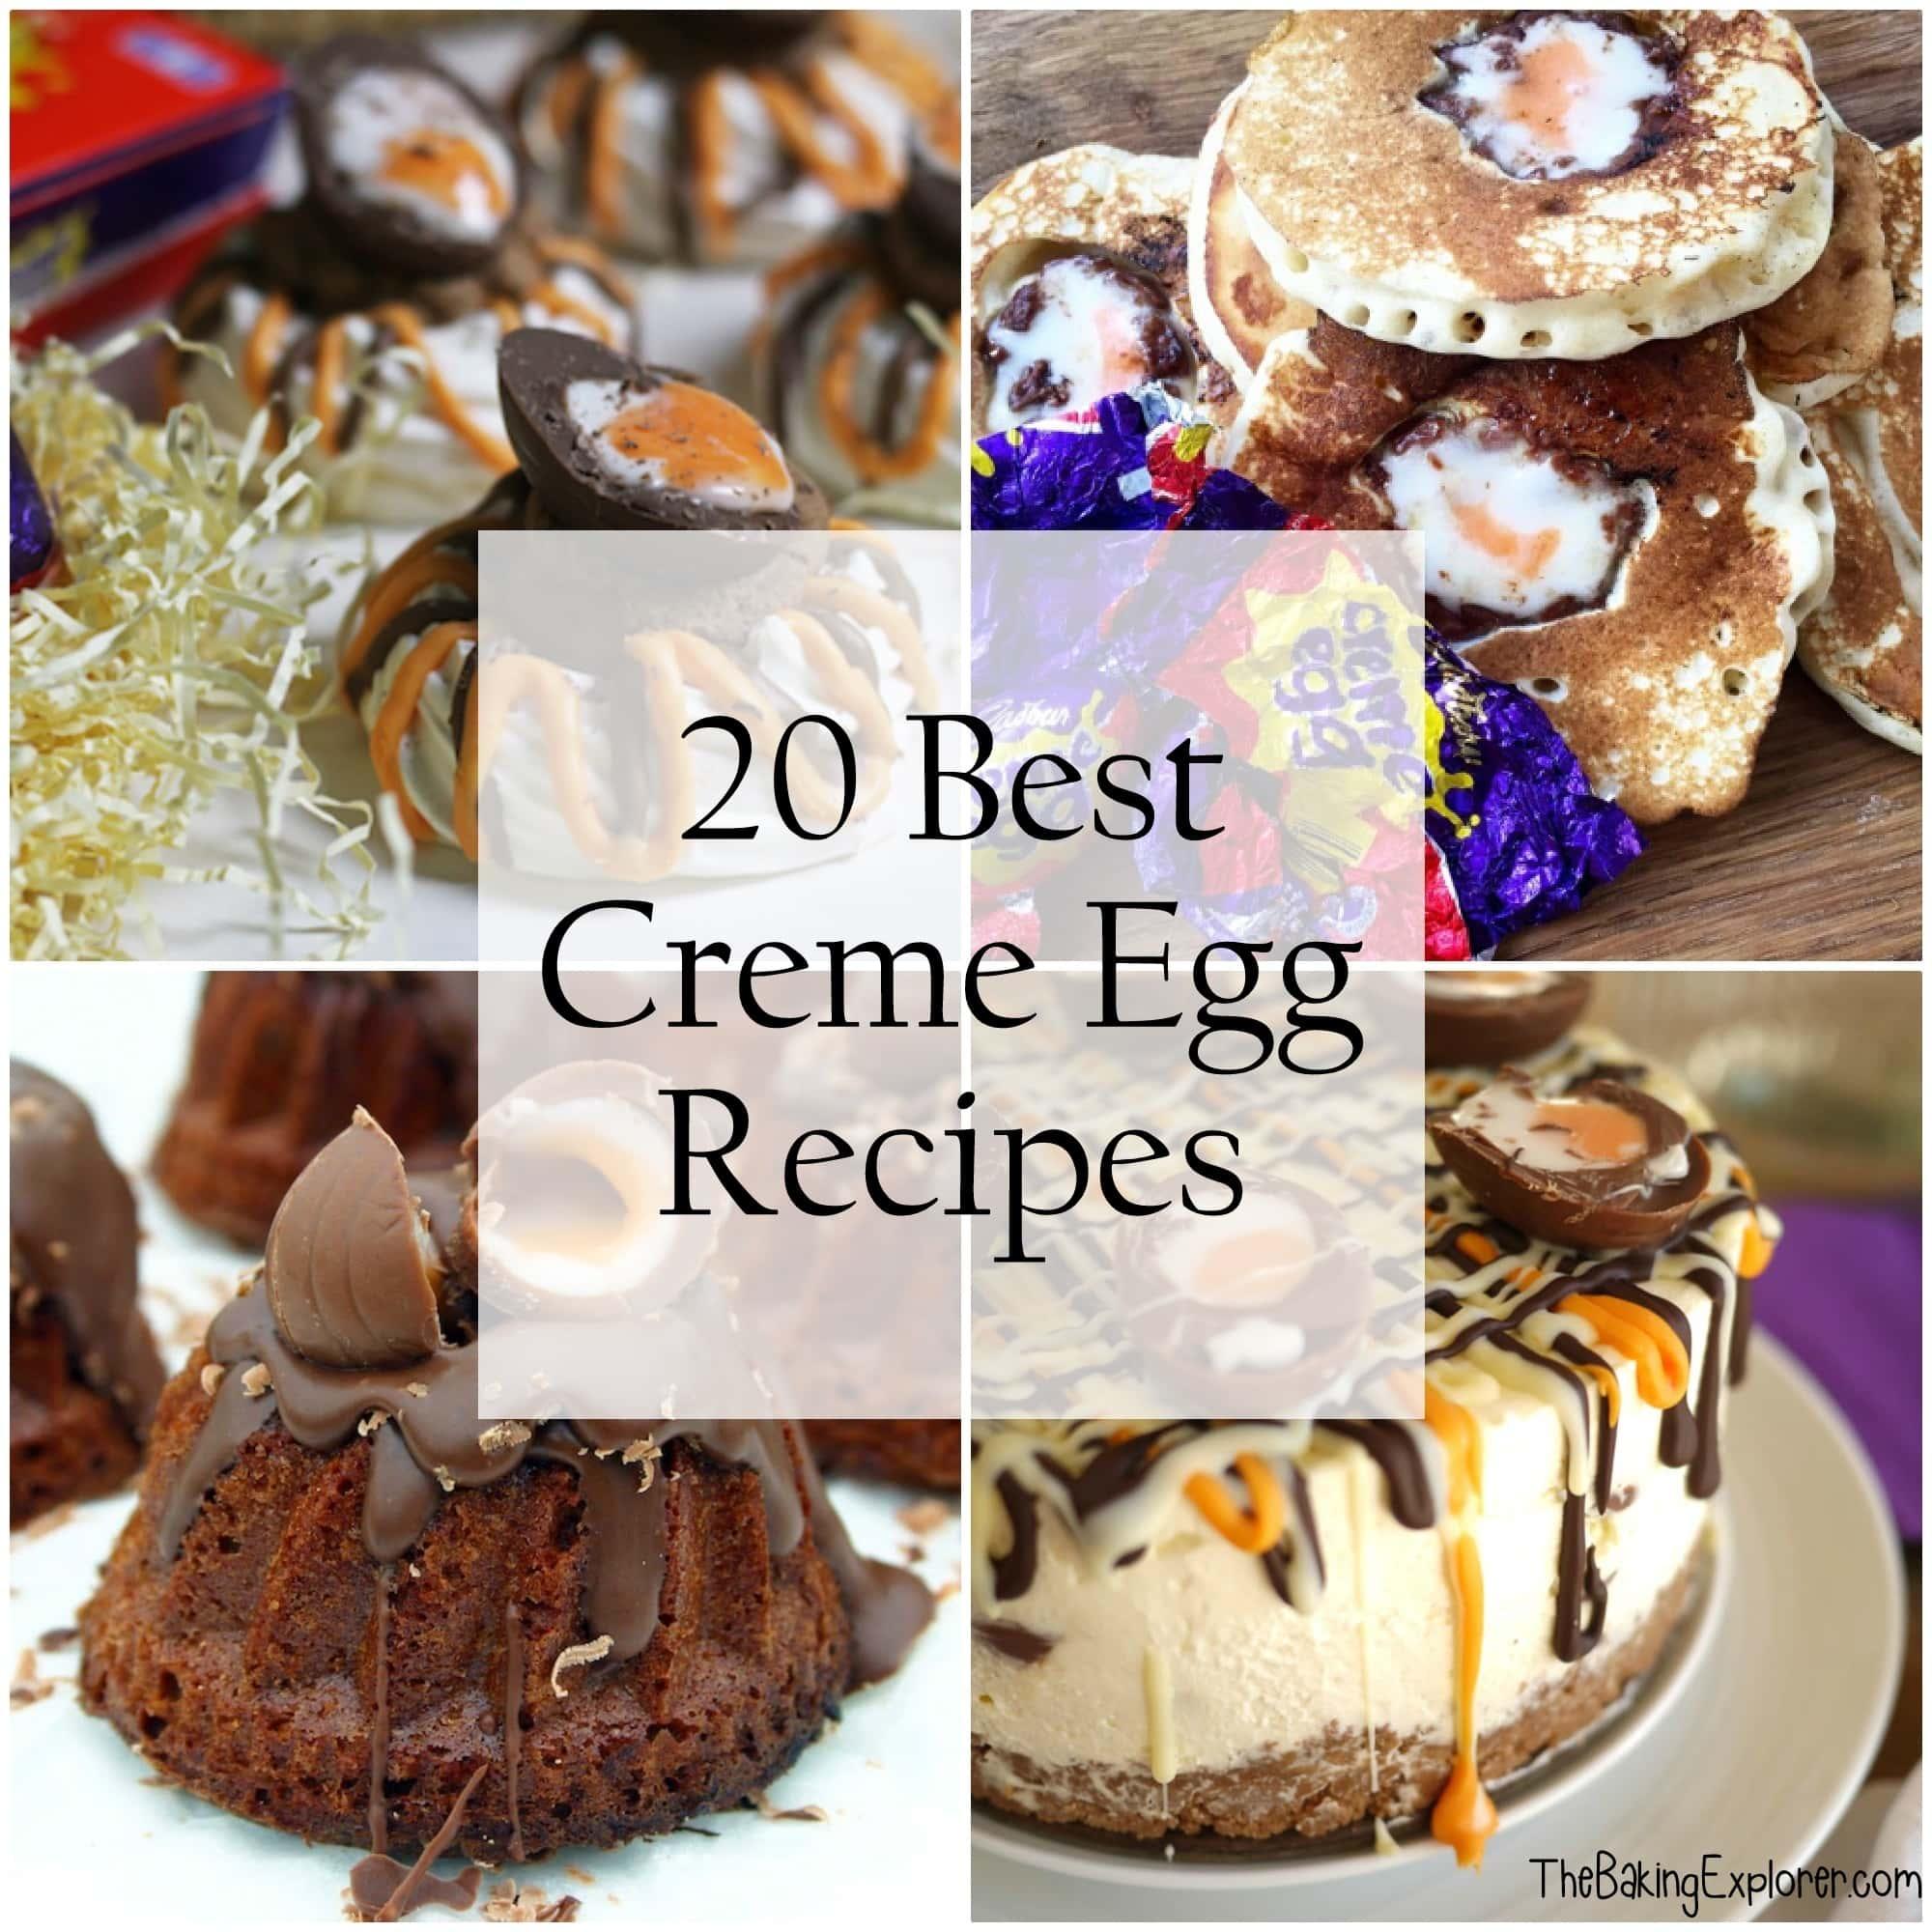 Best Creme Egg Recipes